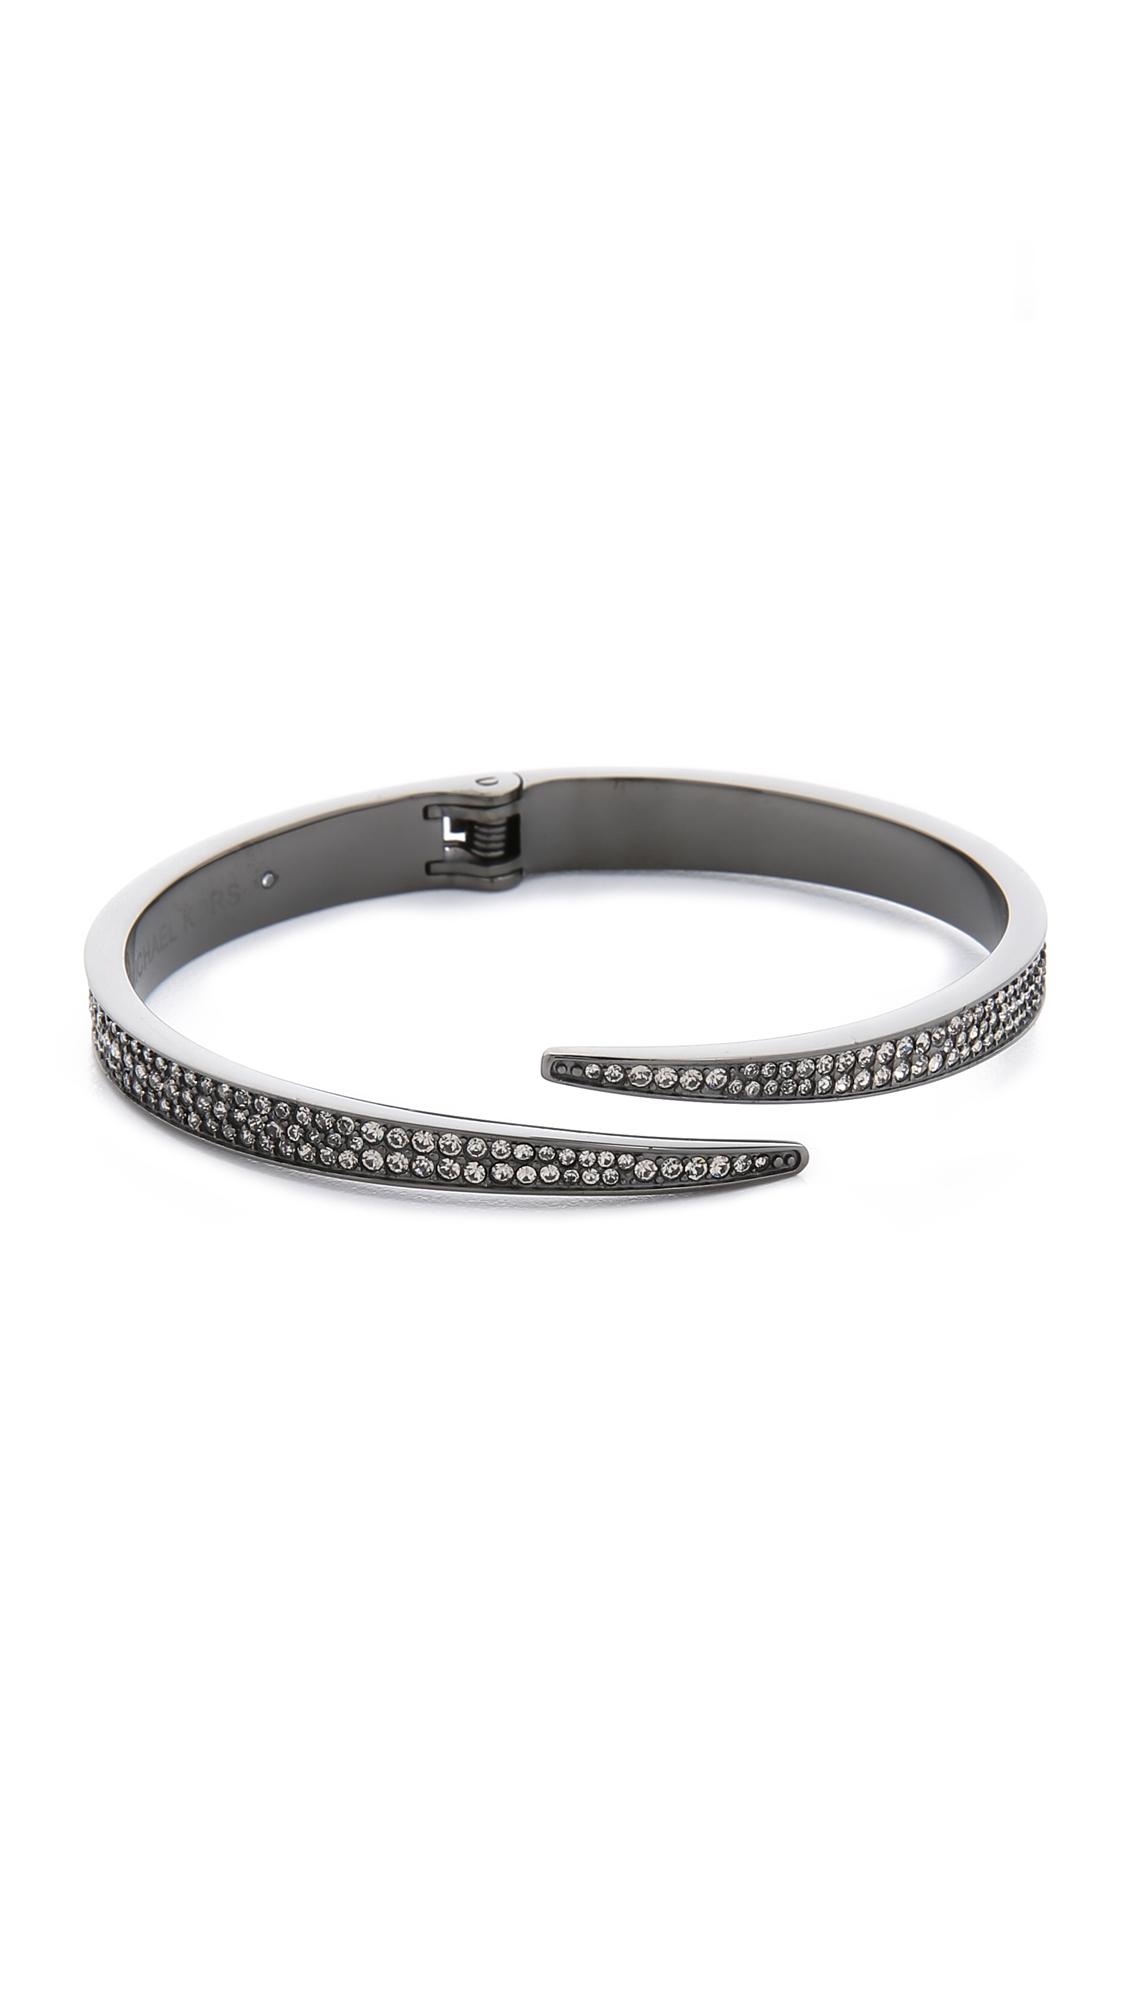 Michael Kors Pave Matchstick Hinge Bangle Bracelet